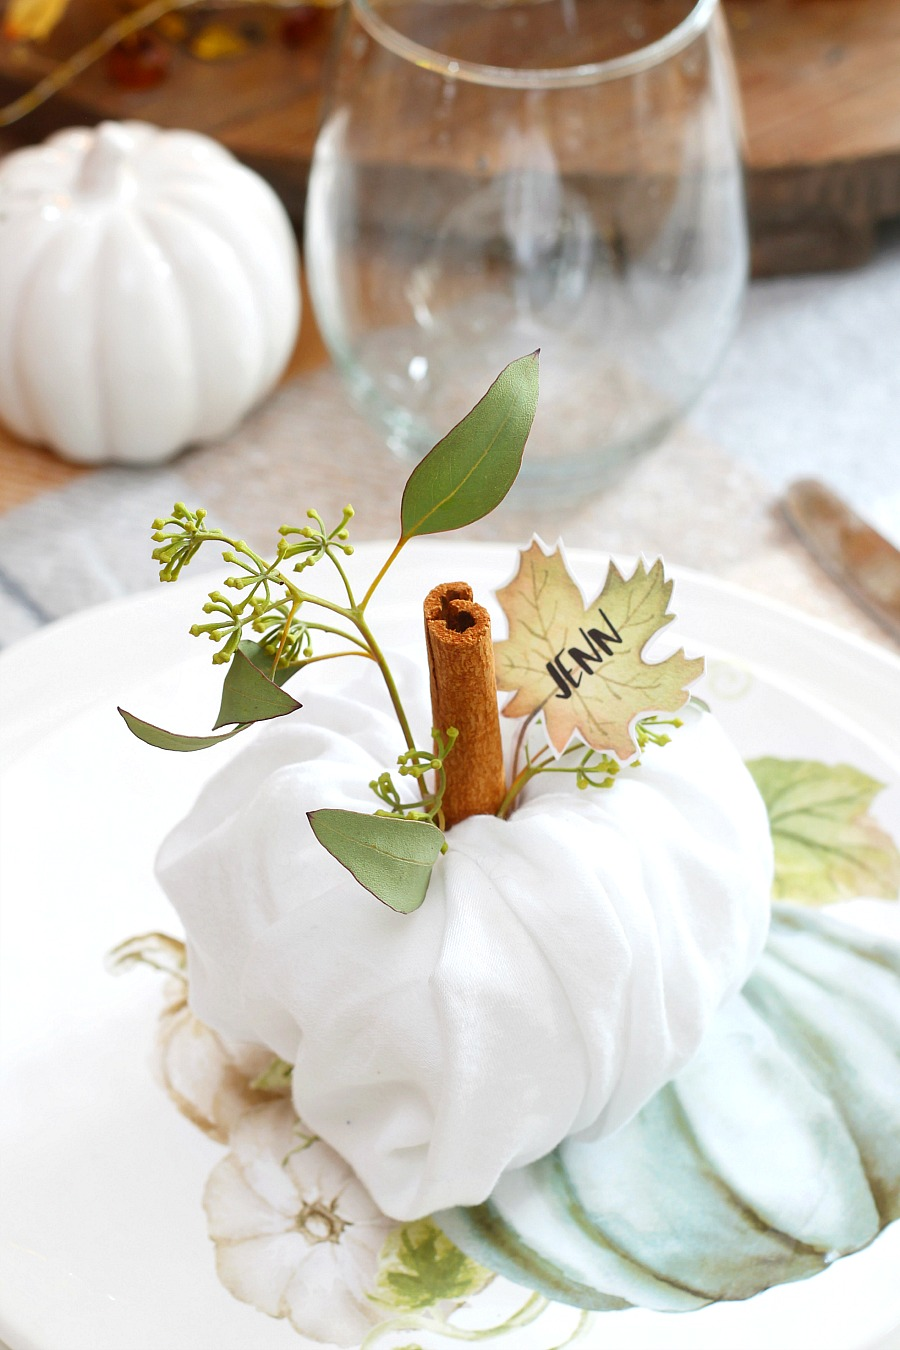 Thanksgiving Place Settings - Pumpkin Napkin Fold #thanksgivingtablesettings